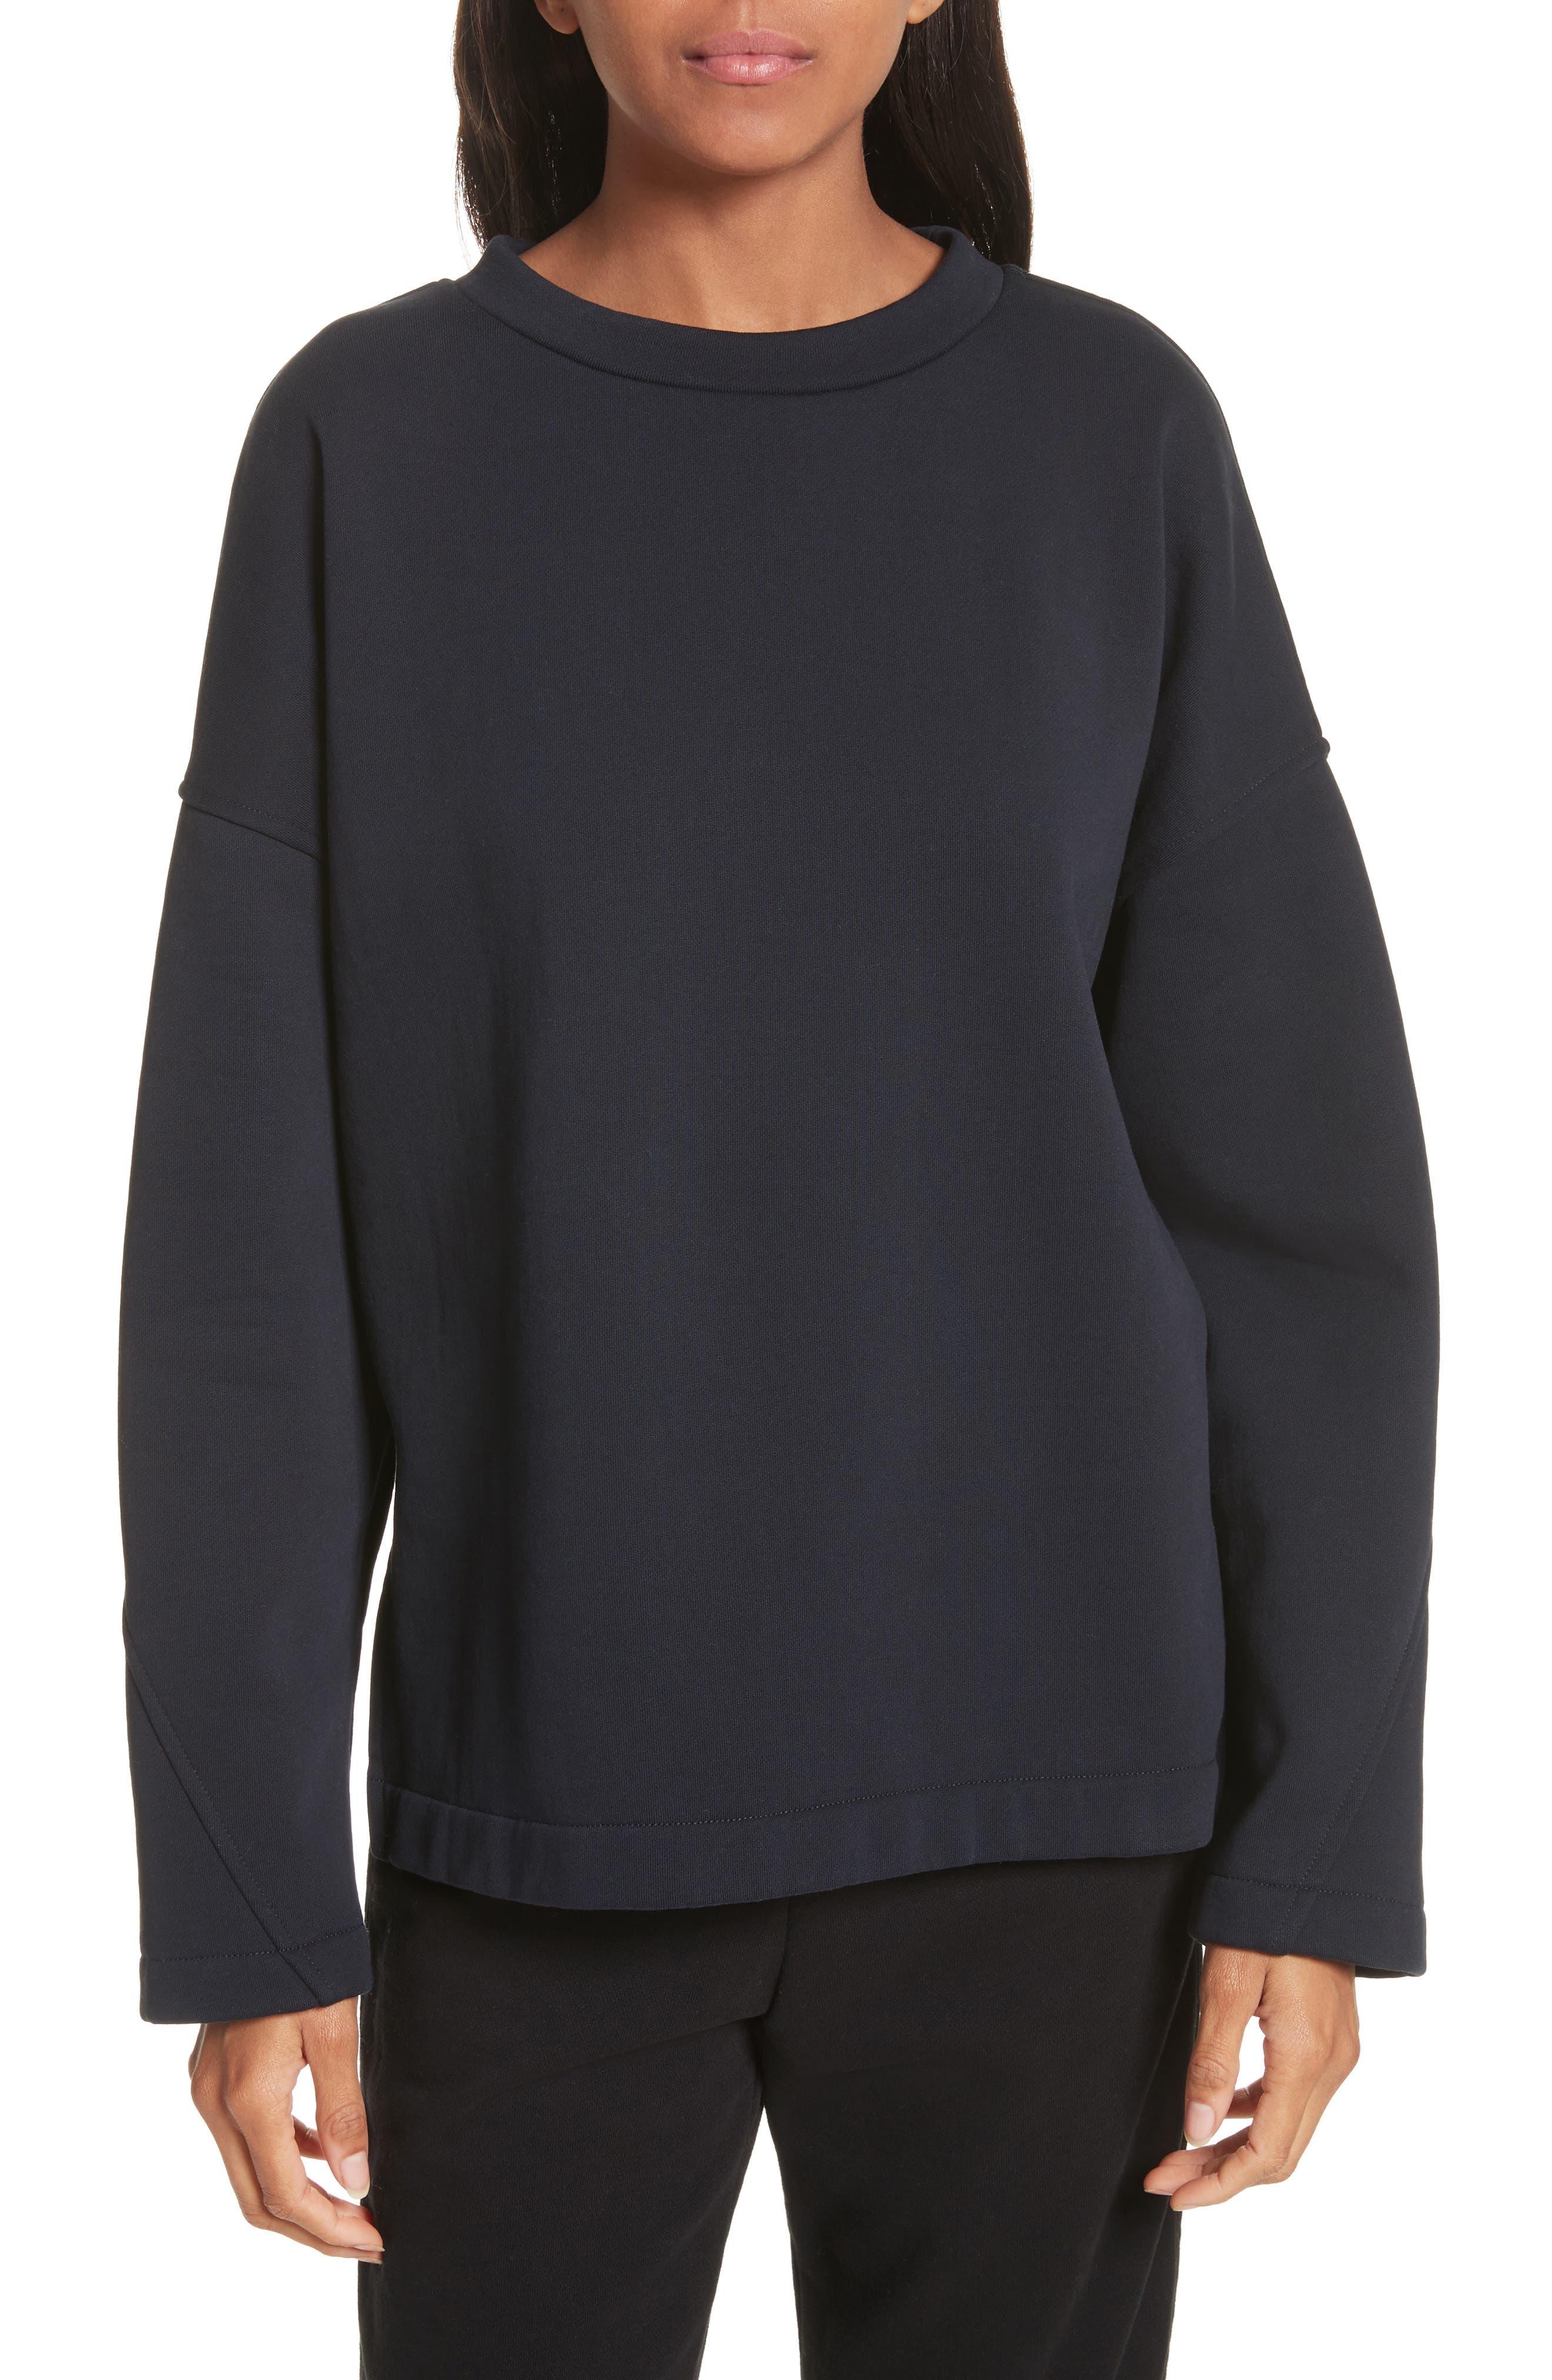 Alternate Image 1 Selected - Vince Mock Neck Sweatshirt